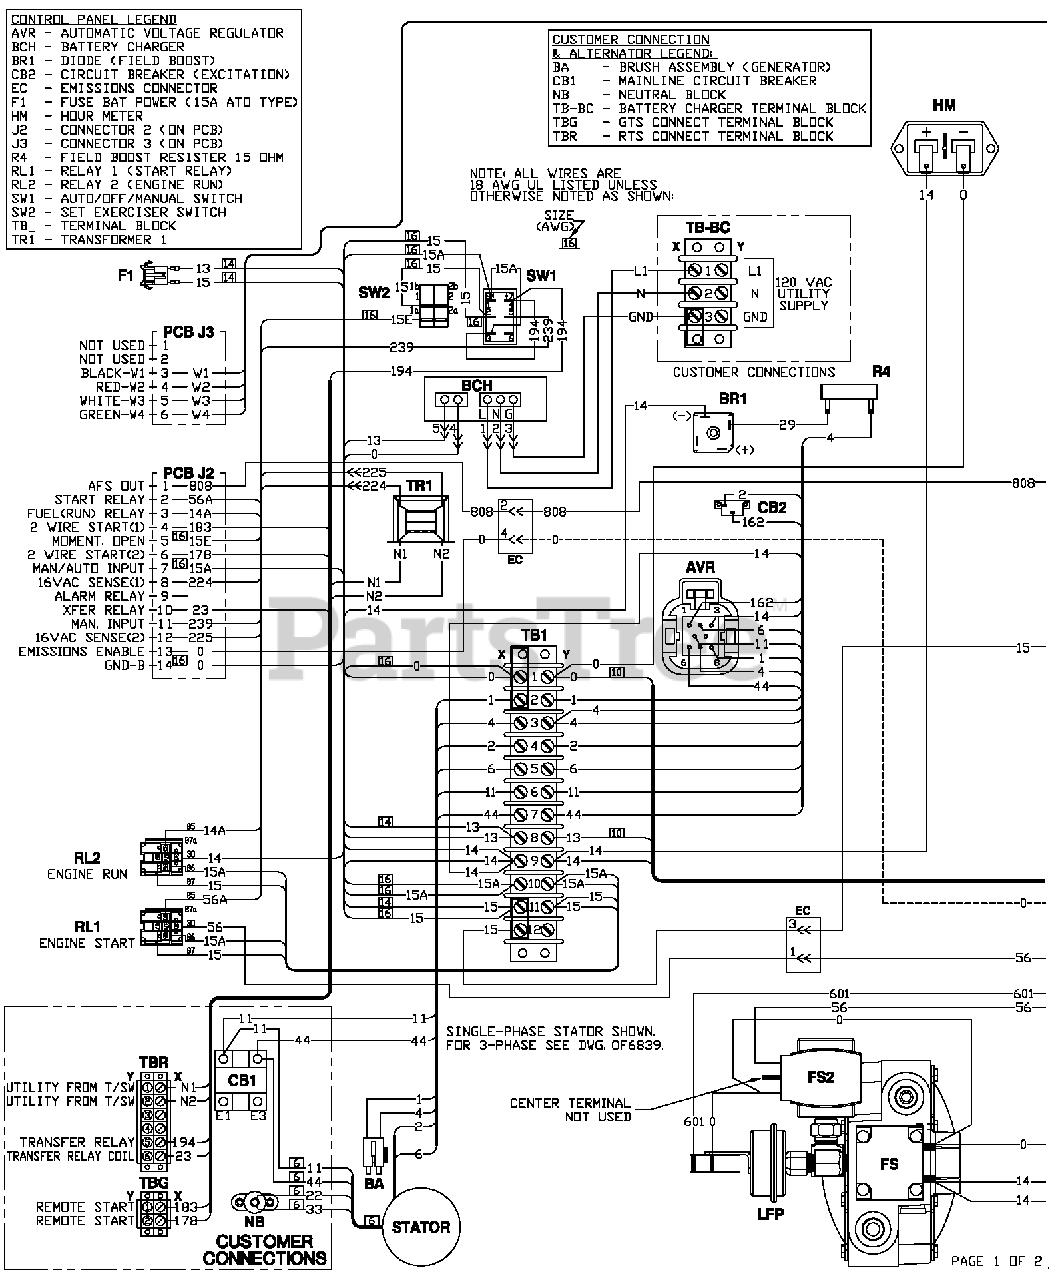 Generac QT02016JNSN - Generac 20kW Home Standby Generator (SN: 4981733 -  4981733) (2016) Wiring Diagram (0H4371) Parts Lookup with Diagrams |  PartsTreePartsTree